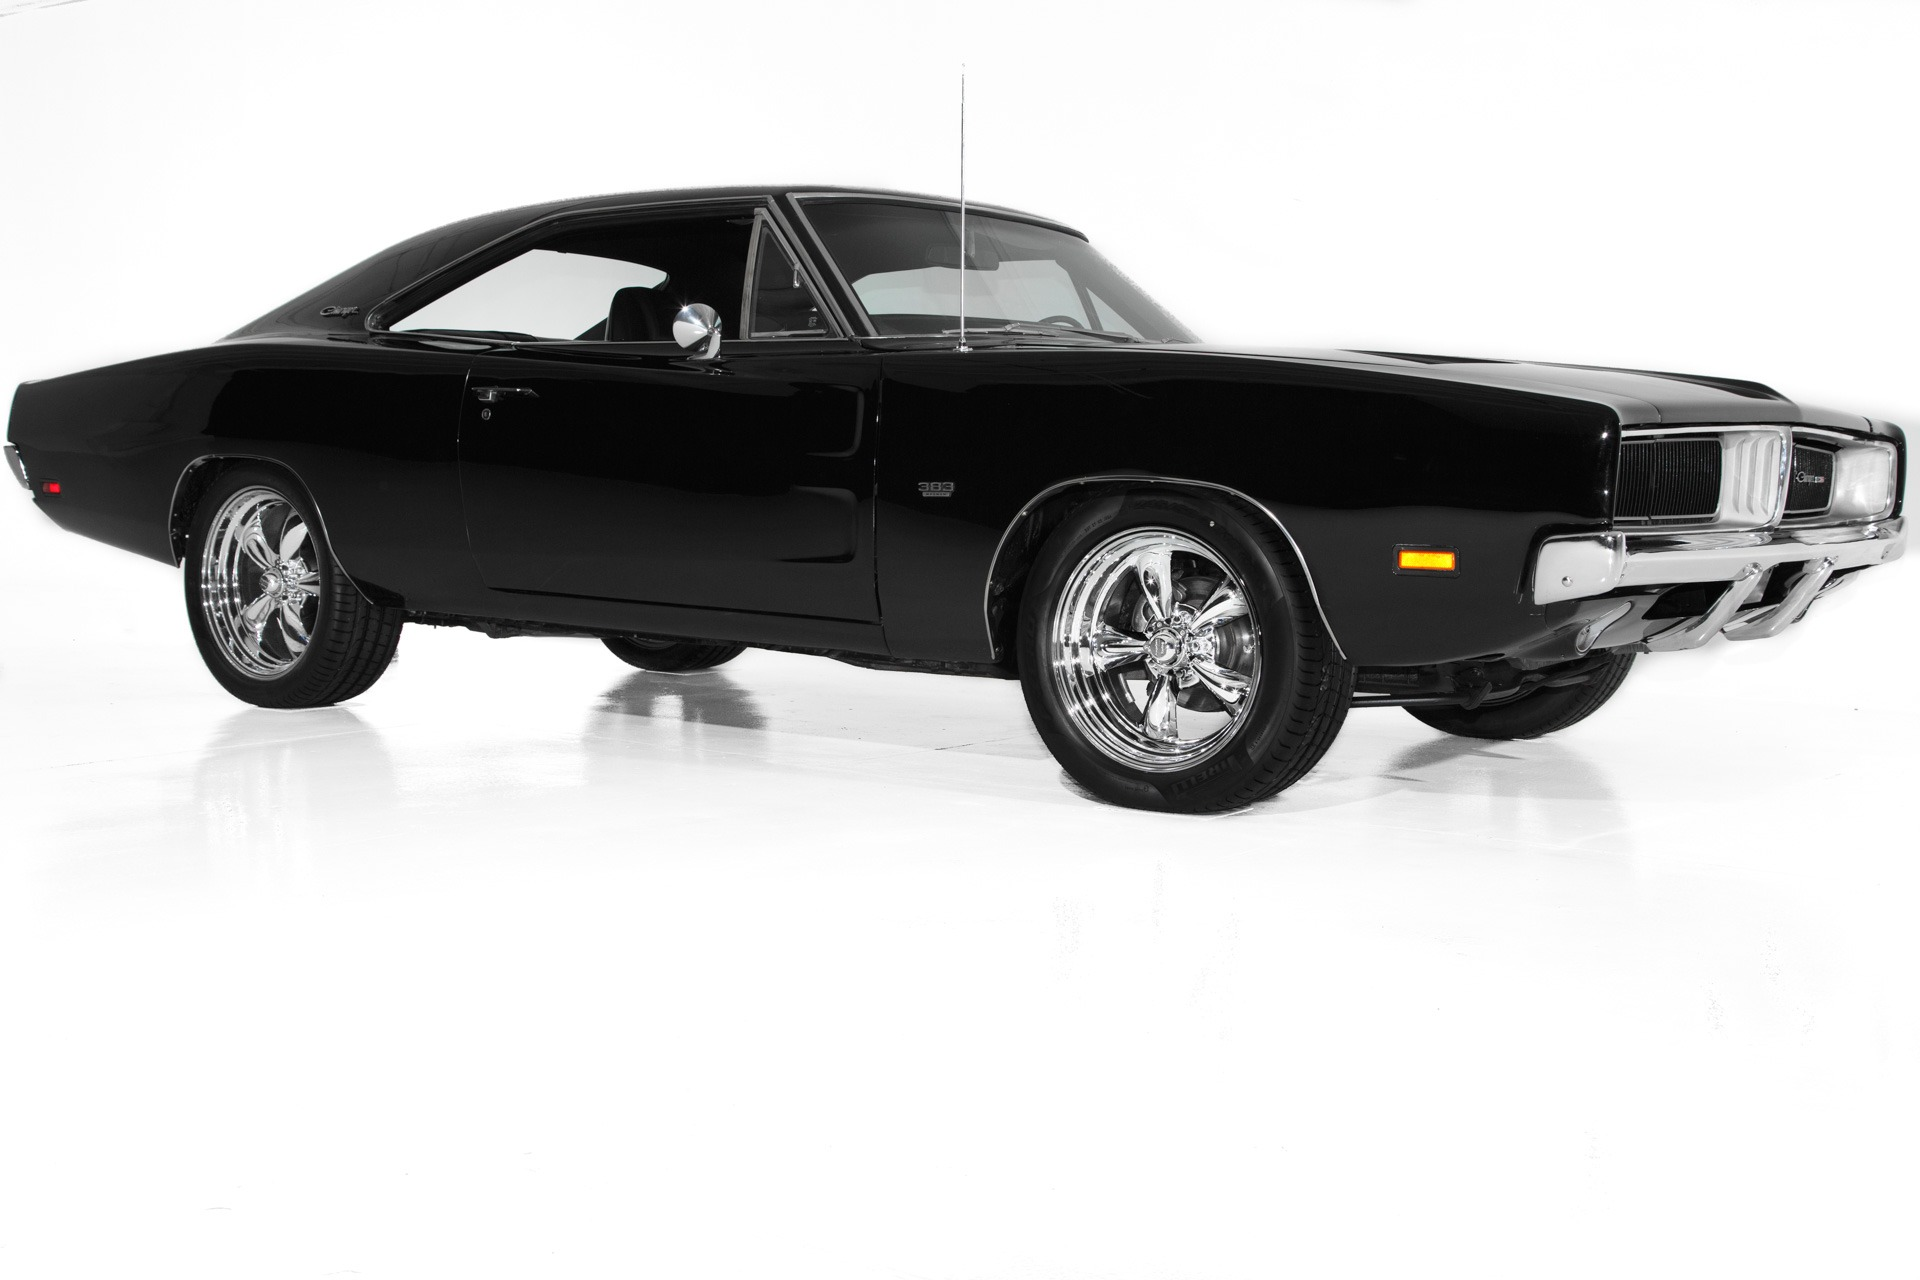 Photo 1969 Dodge Charger Black 383 Big Block 4 speed